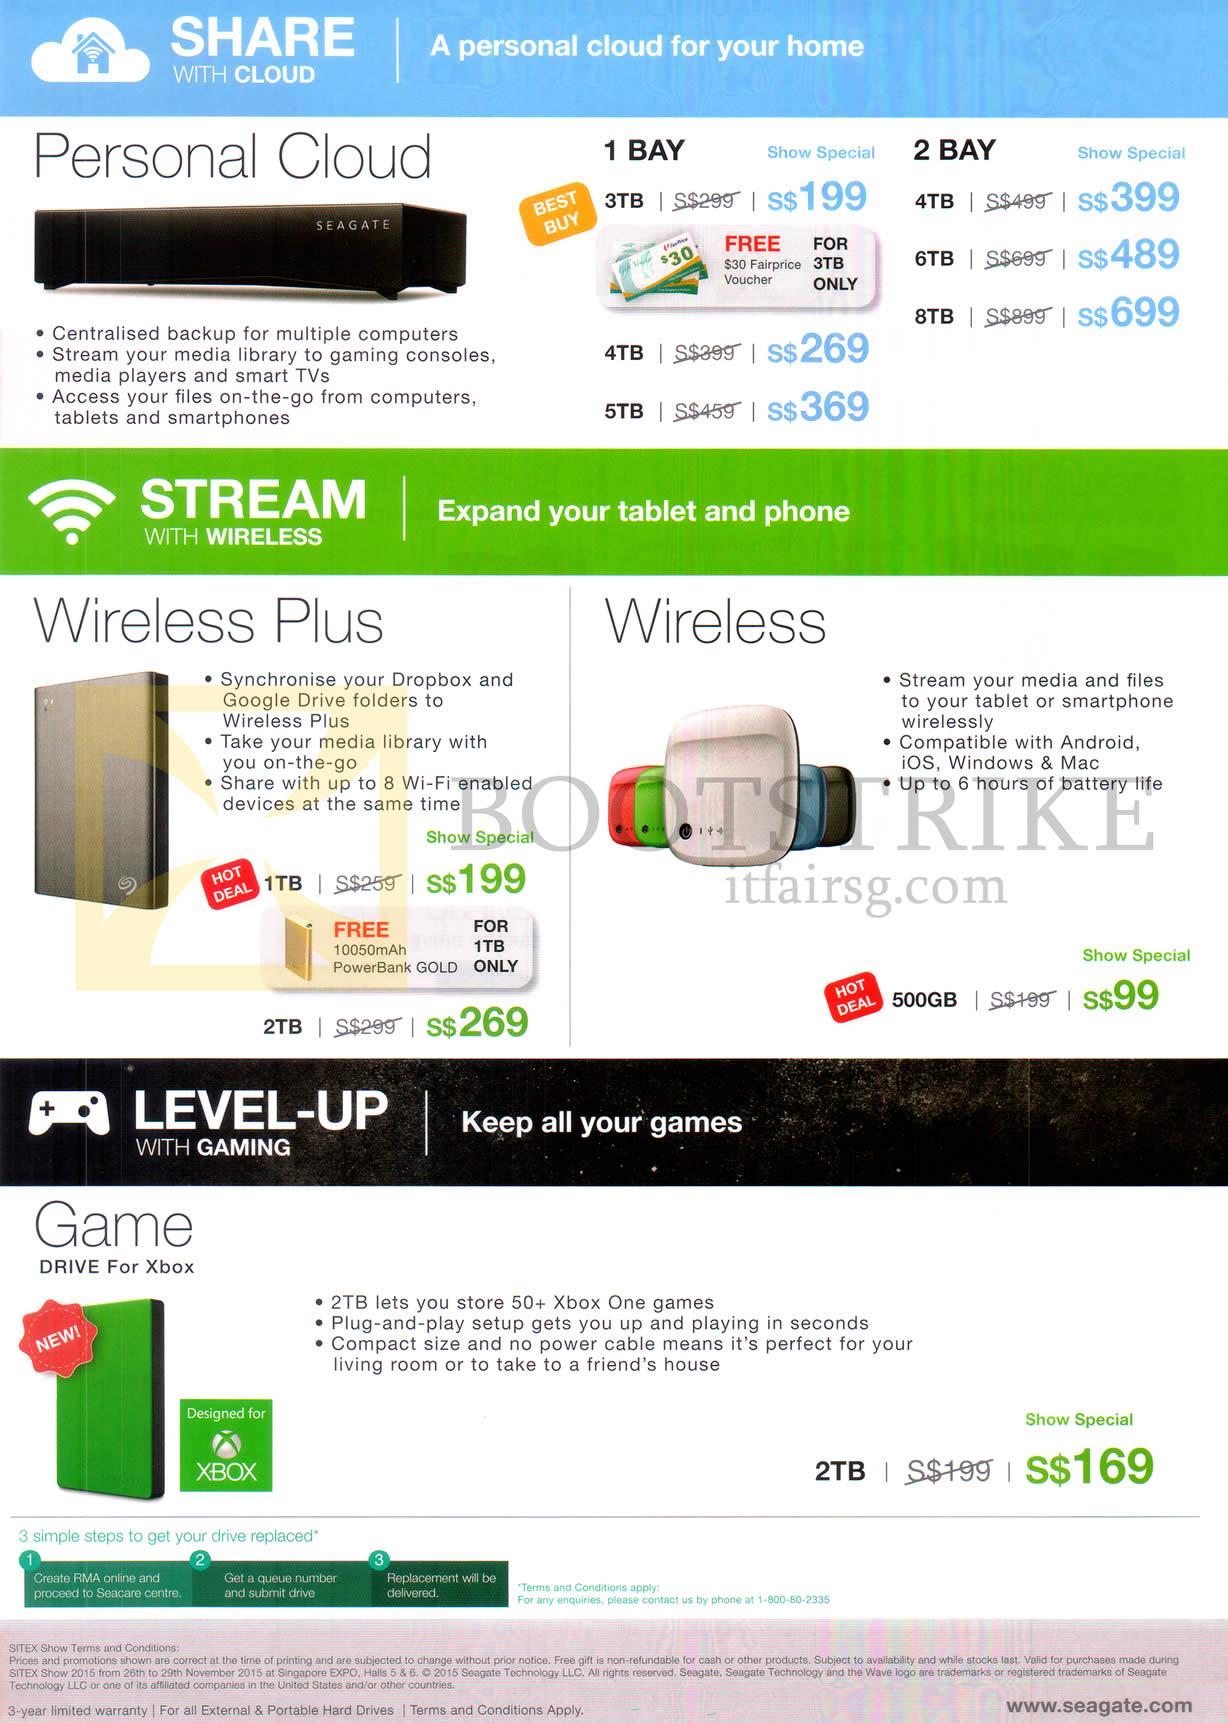 Seagate Personal Cloud, Wireless, Wireless Plus, Game Drive